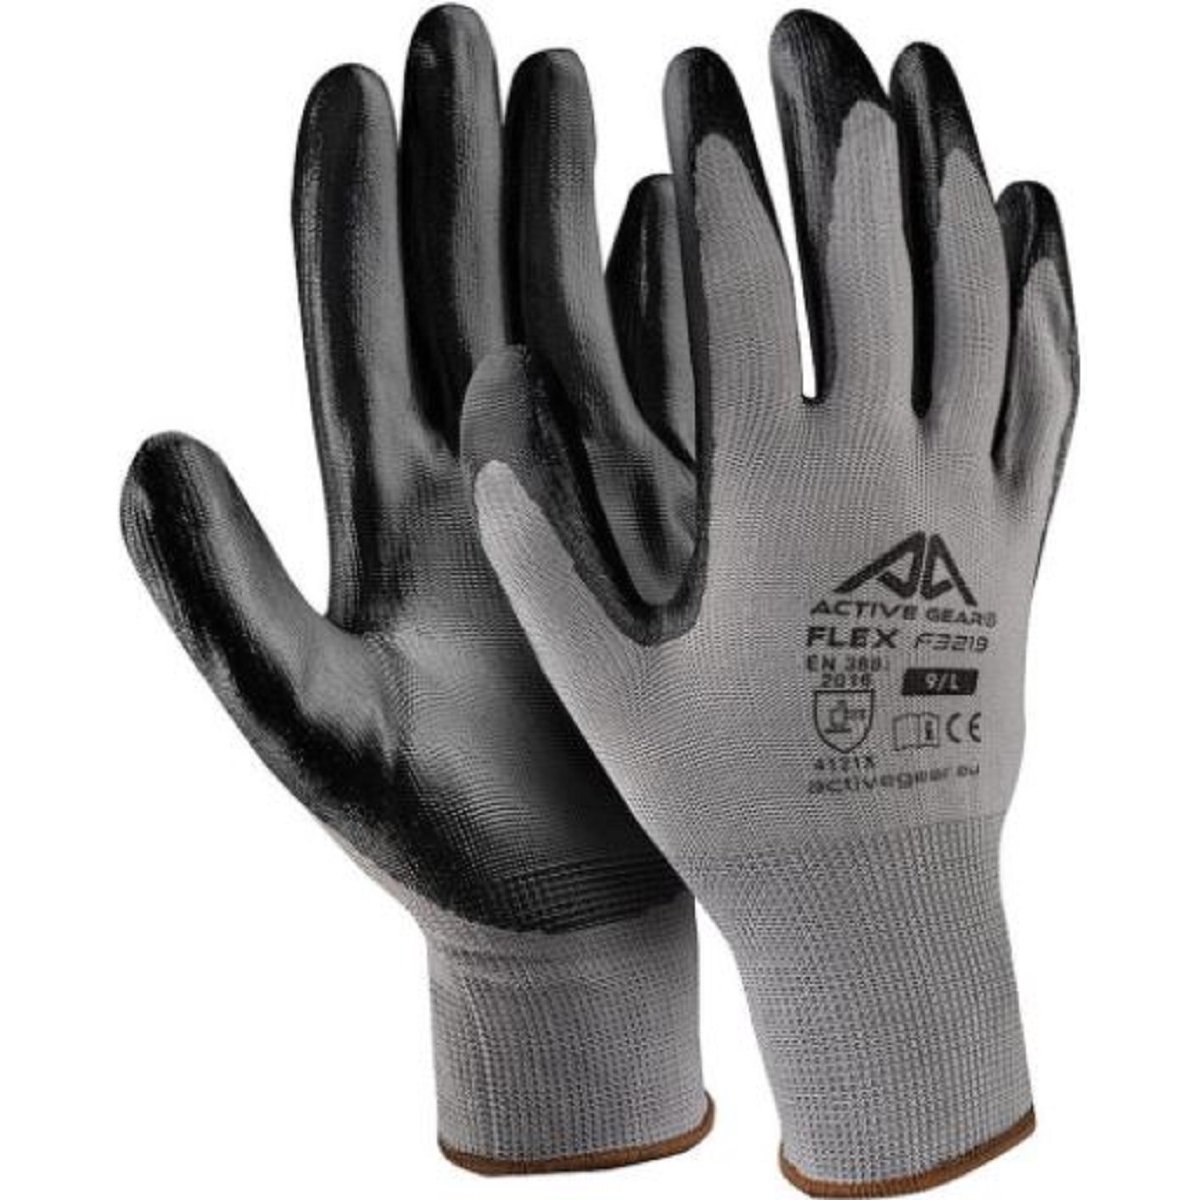 Γάντια FLEX F3218 / F3219 / F3220 / F3221